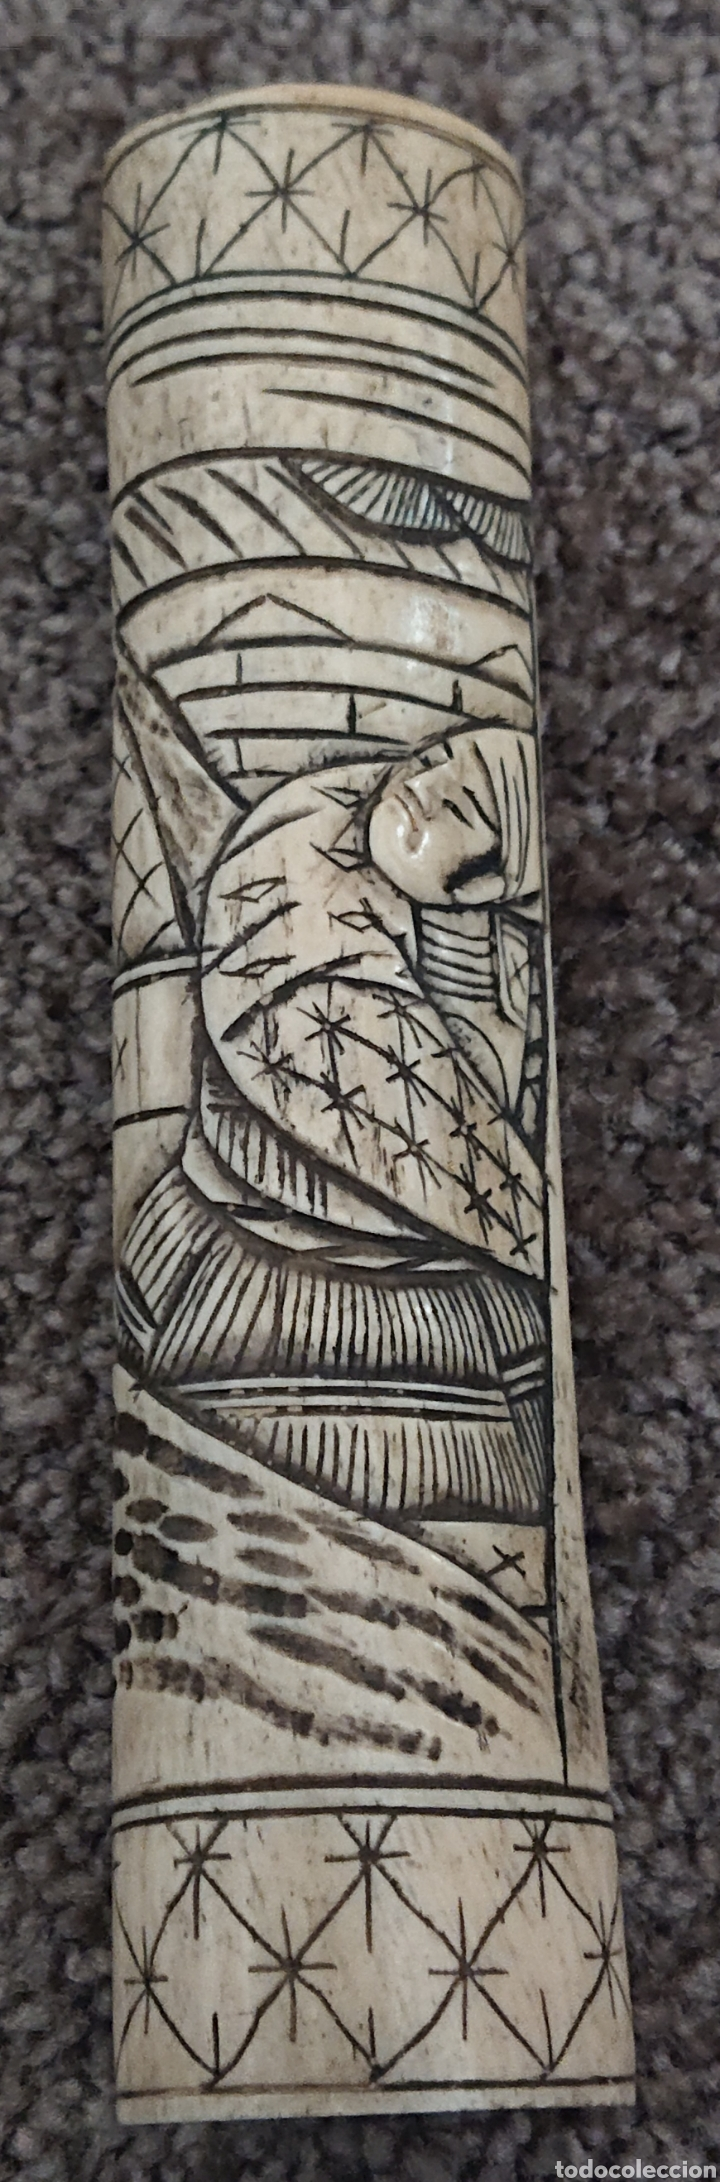 Arte: Funda sable o espada japonés, Japón, hueso o similar, gran pieza, ved fotos - Foto 8 - 276801593